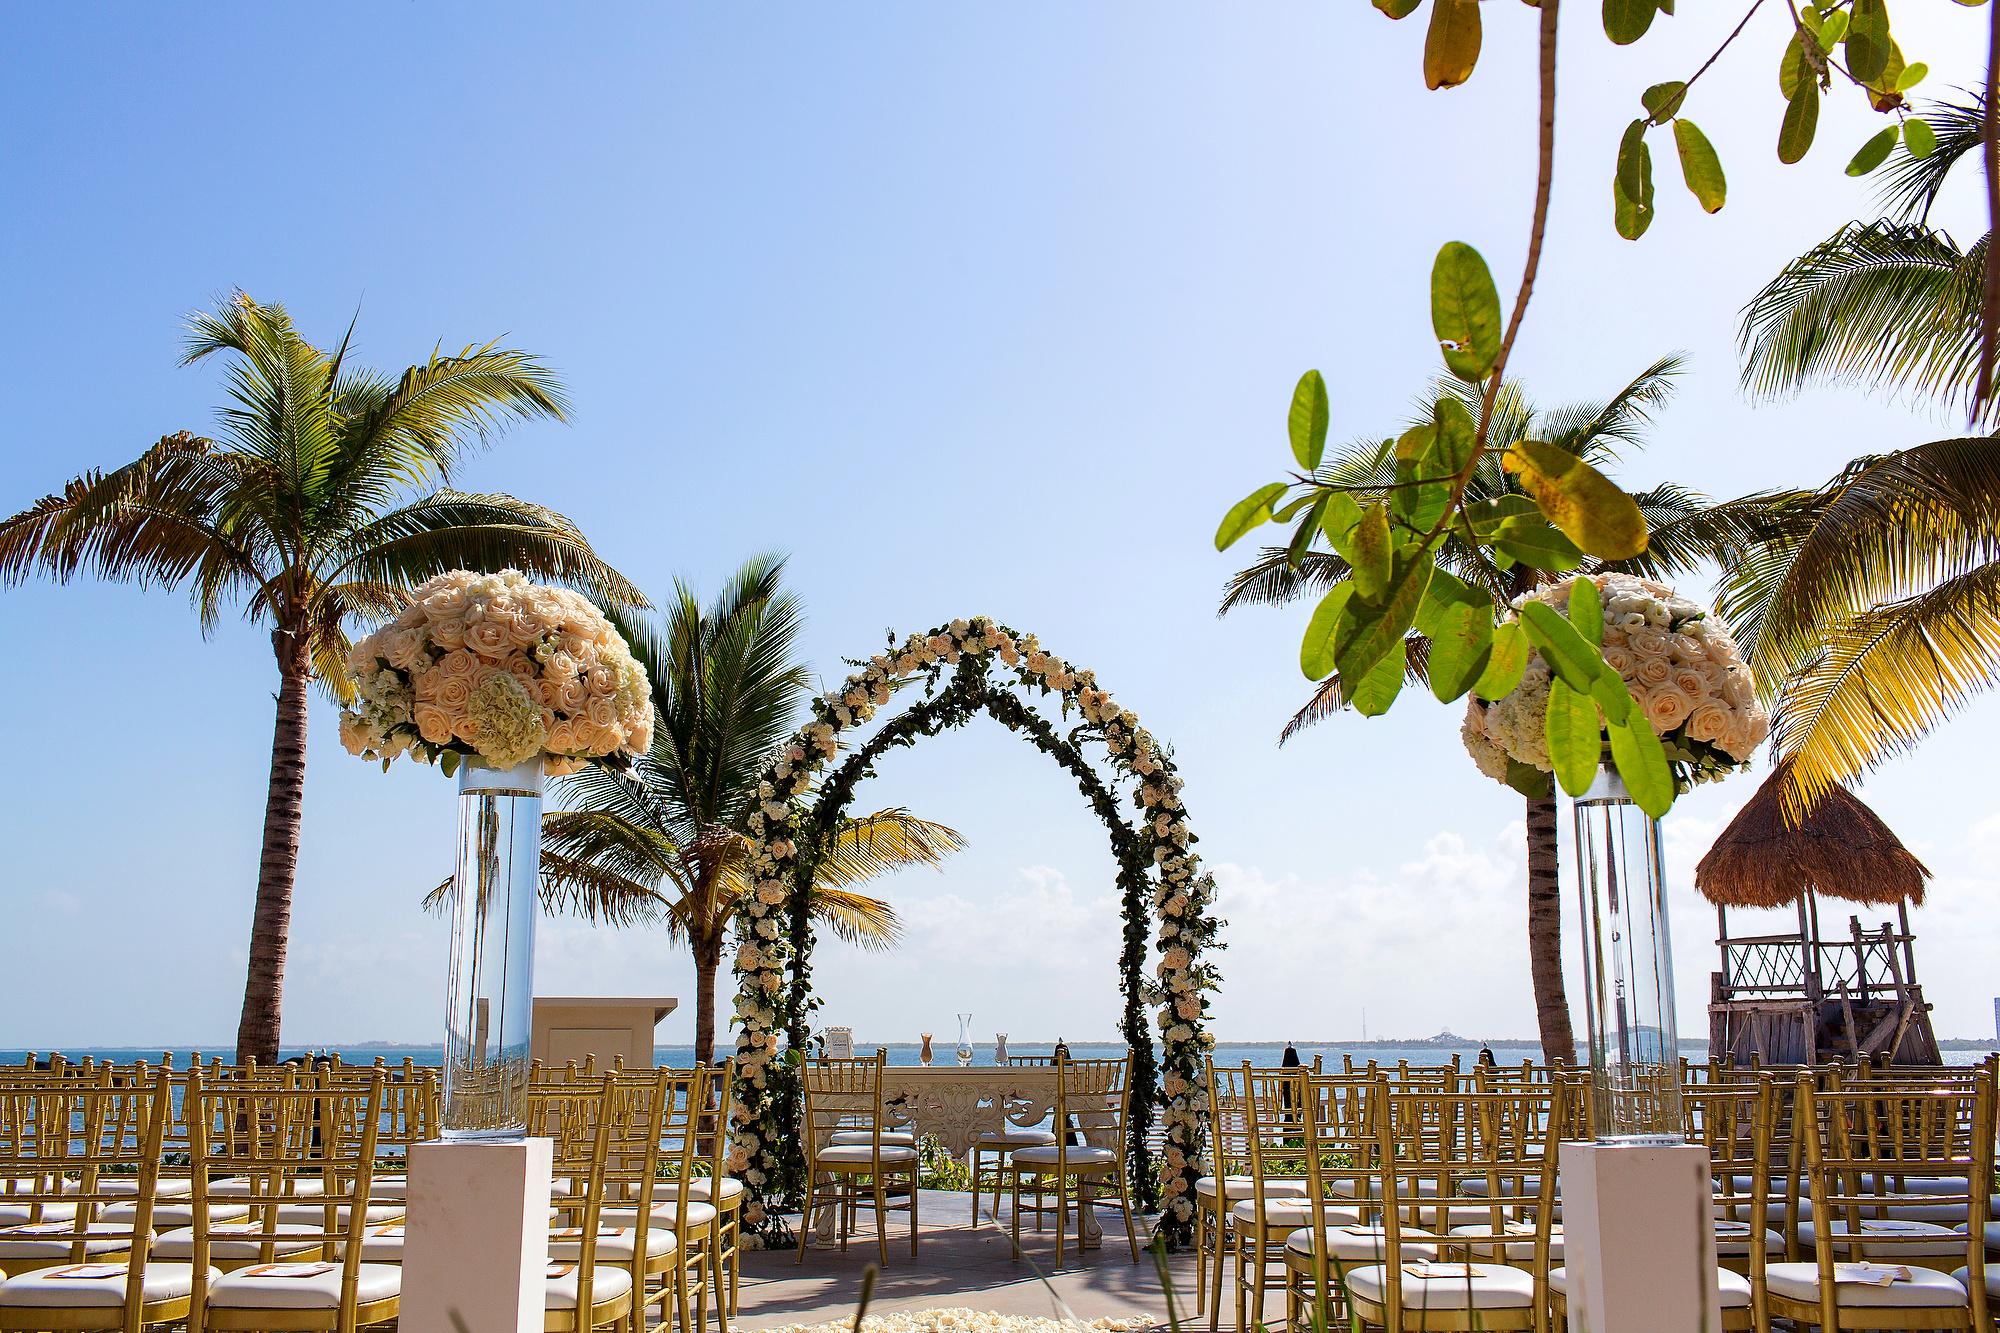 Abi + Lankey's Wedding - Melissa Mercado Photography